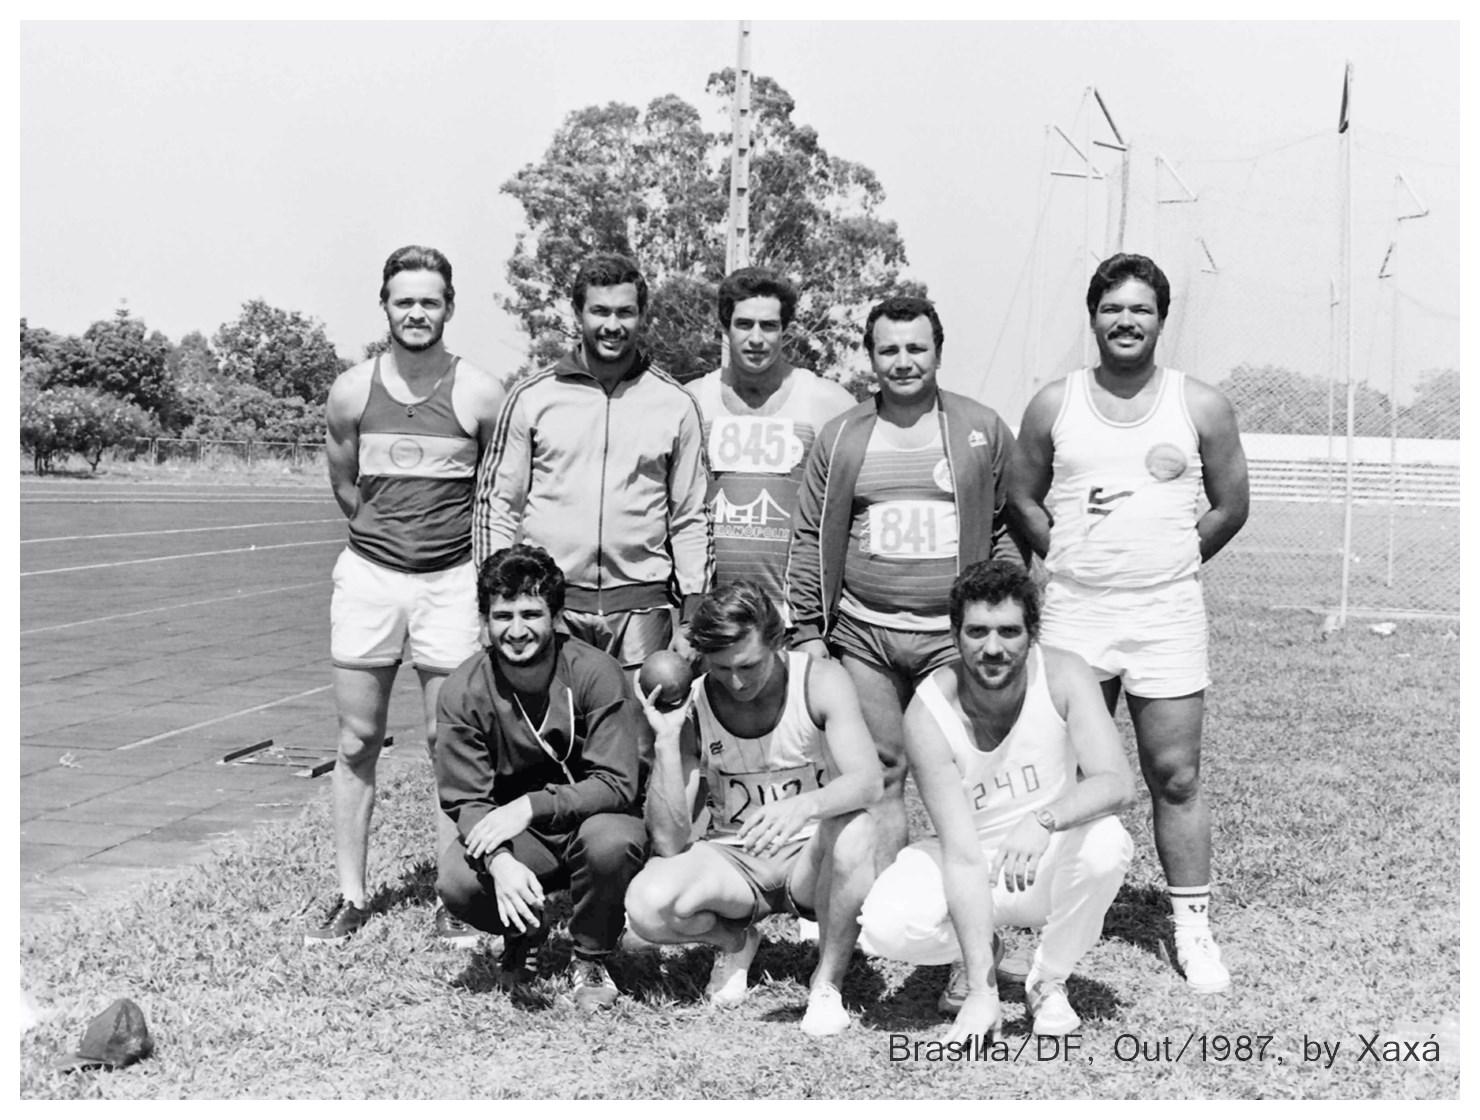 19871010 - DF atletismo arremesso.jpg